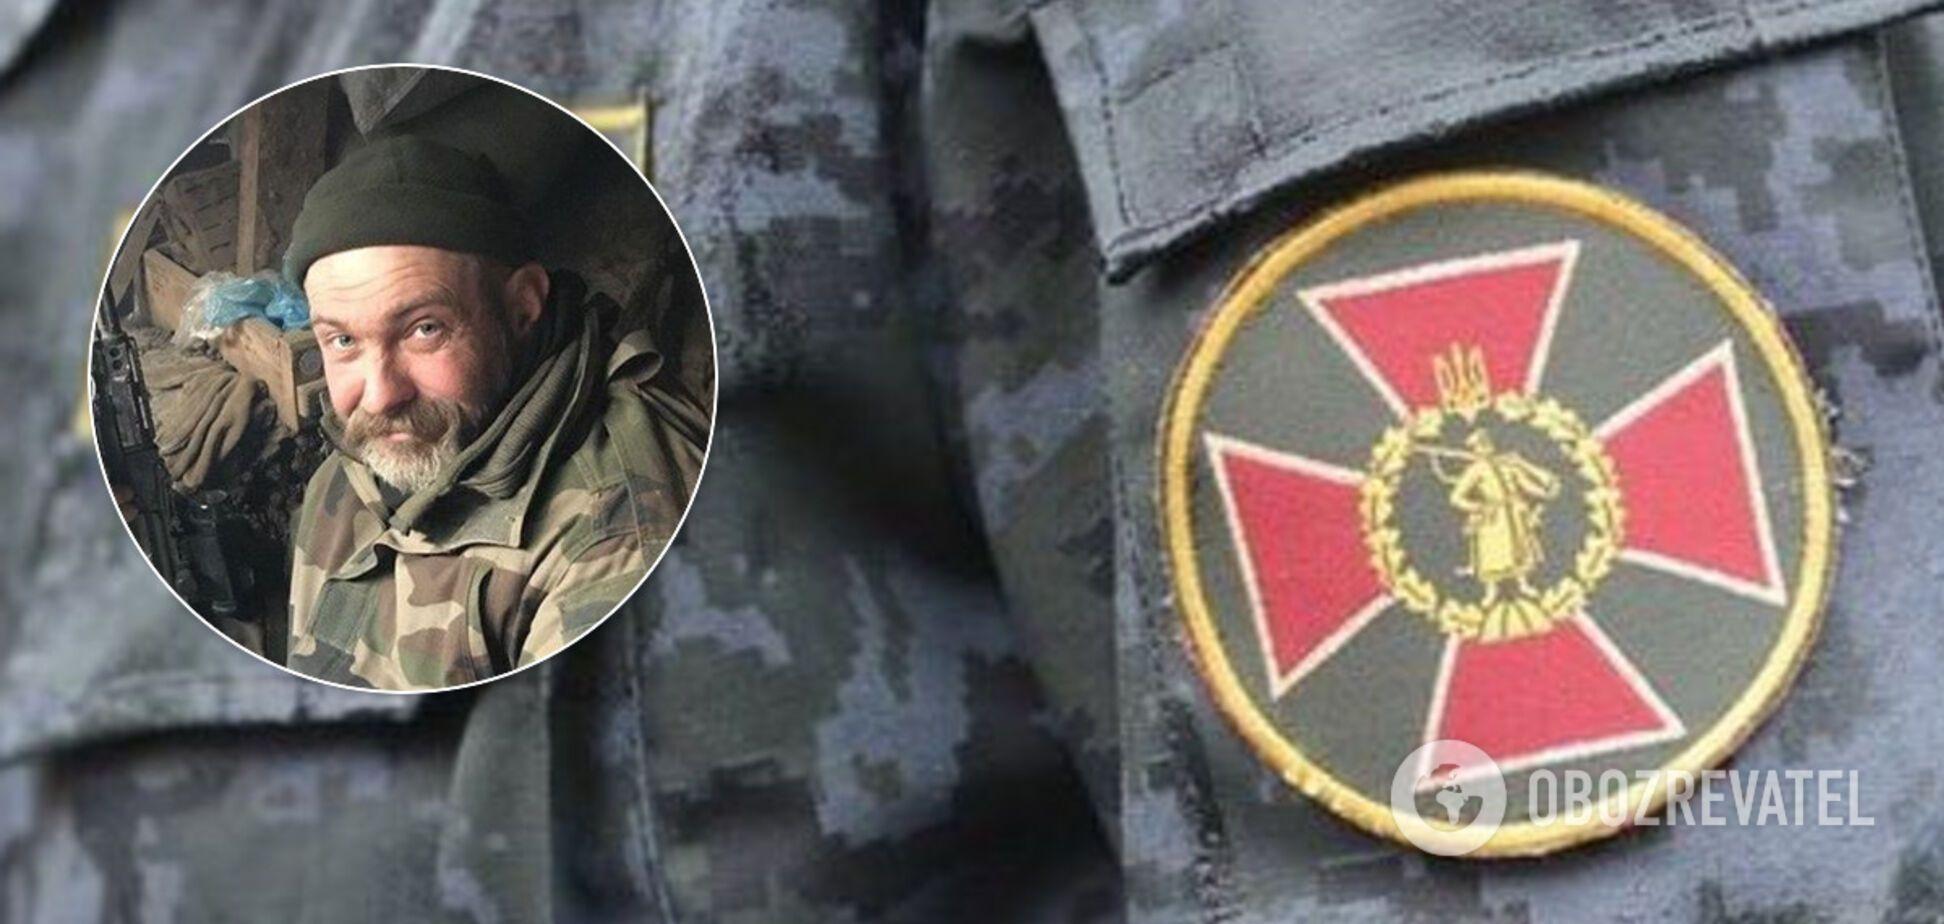 Убийство на Житомирщине: погиб нацгвардеец Вульчин. Фото